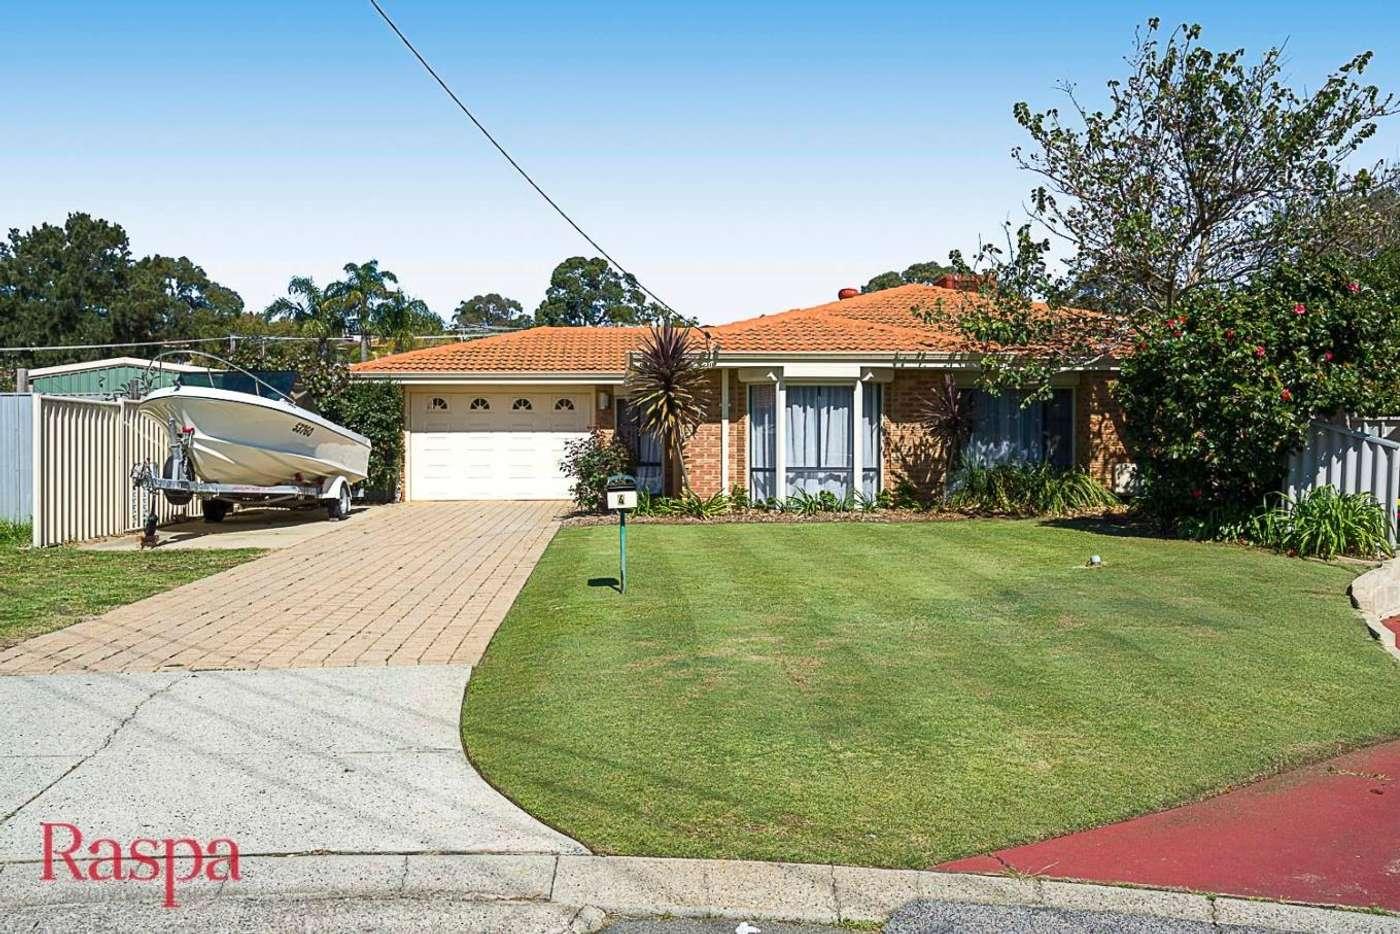 Main view of Homely house listing, 4 Glenorn Court, Yangebup WA 6164